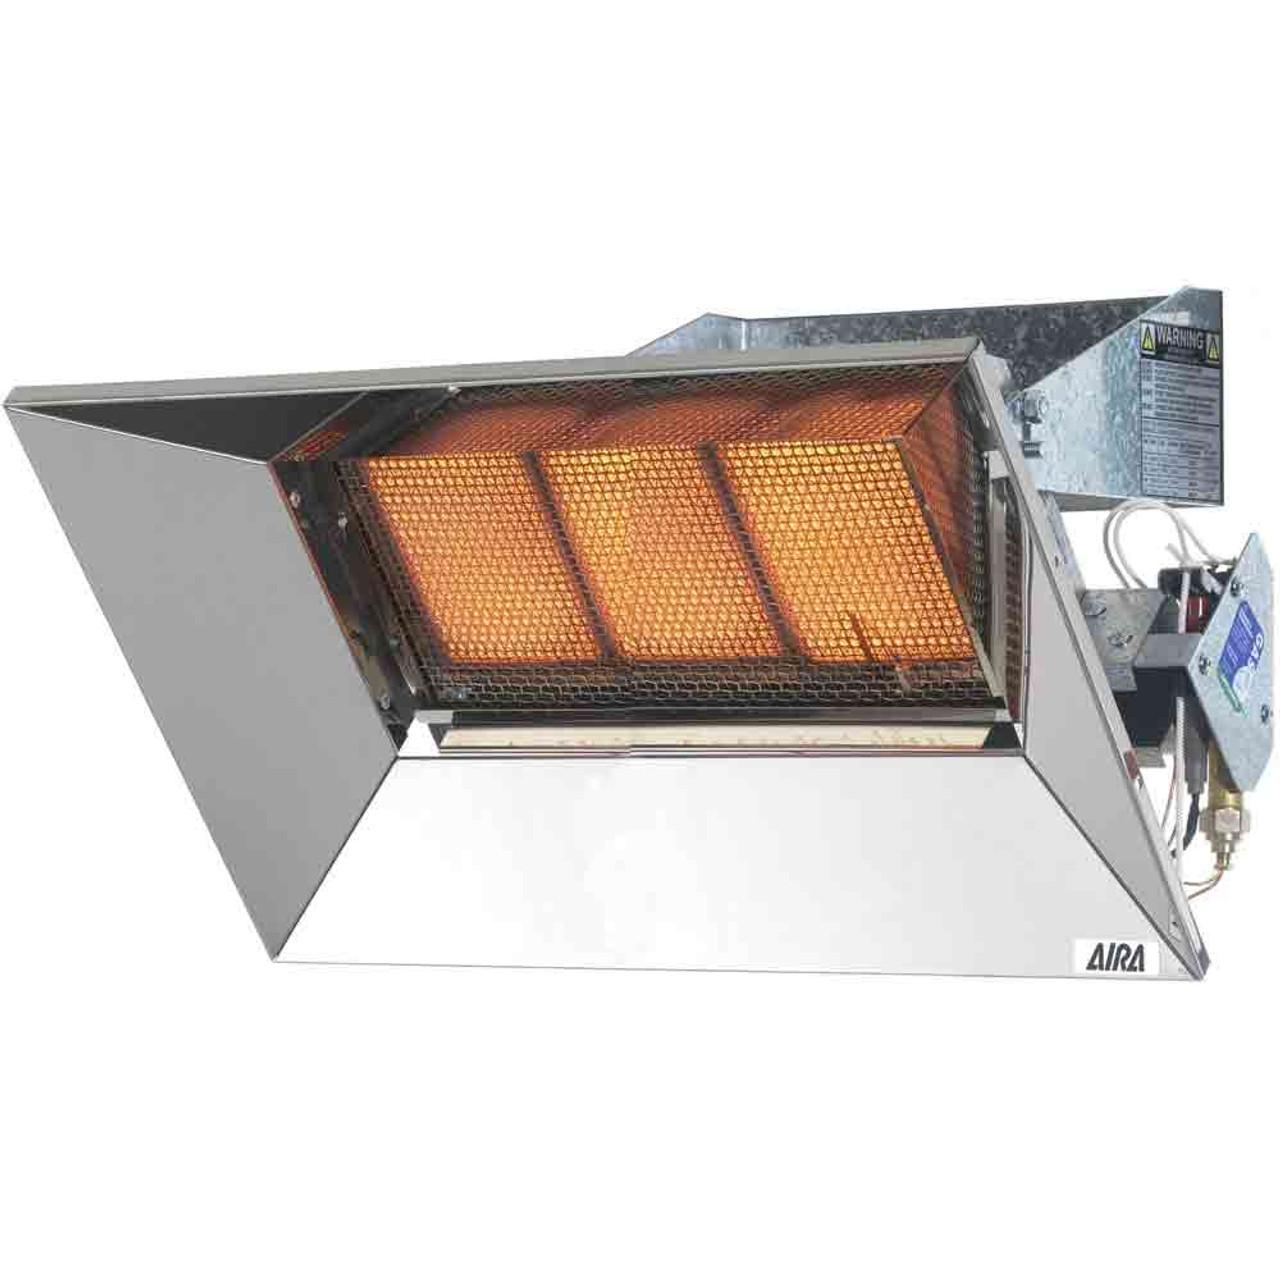 Gas Heater Indoor Outdoor Aira Super Ray Infra Red 7kw Lp